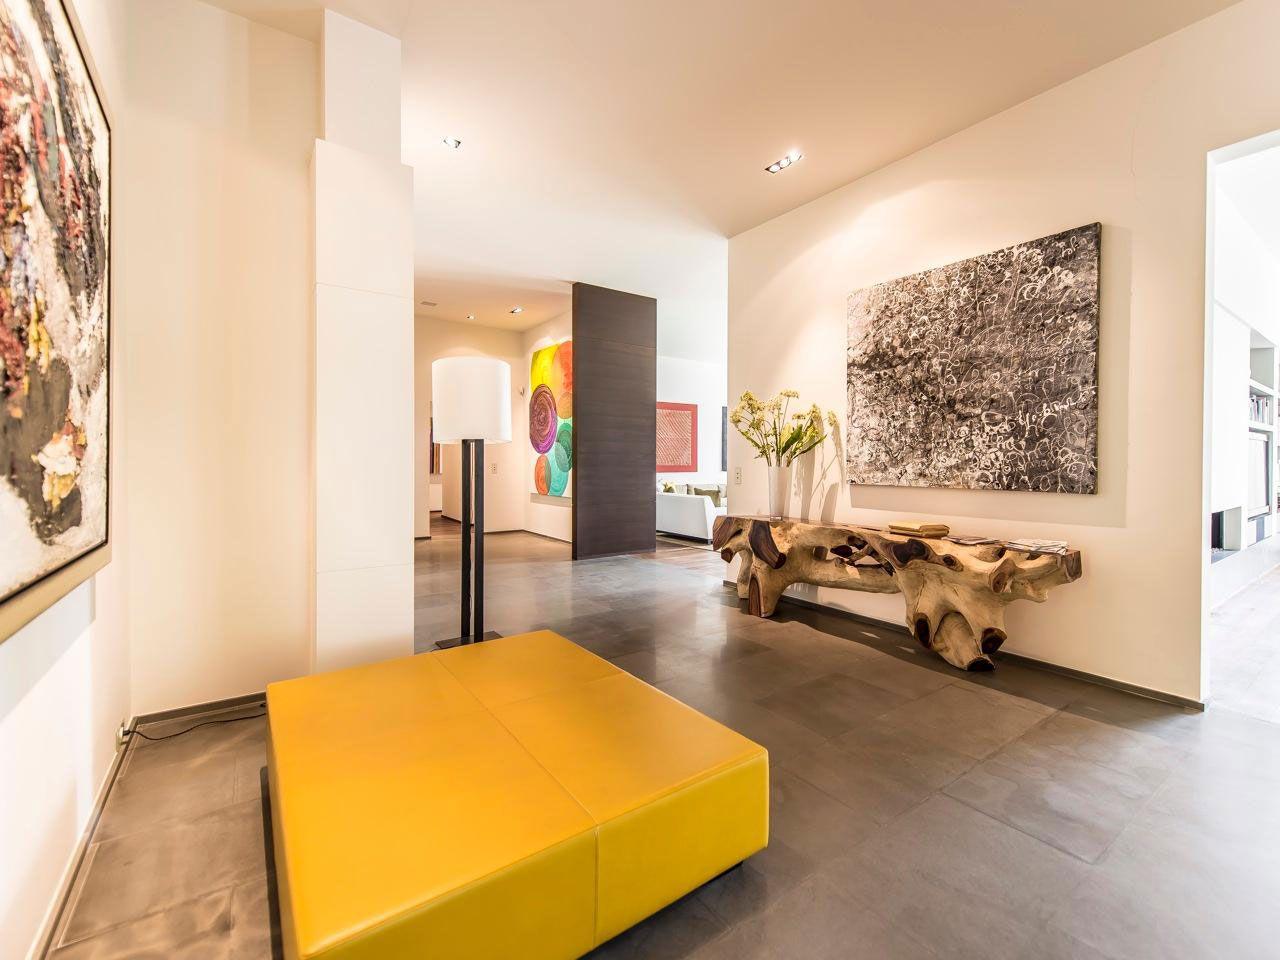 Chic Elegant Apartment in Brussels With Bright Interiors-03